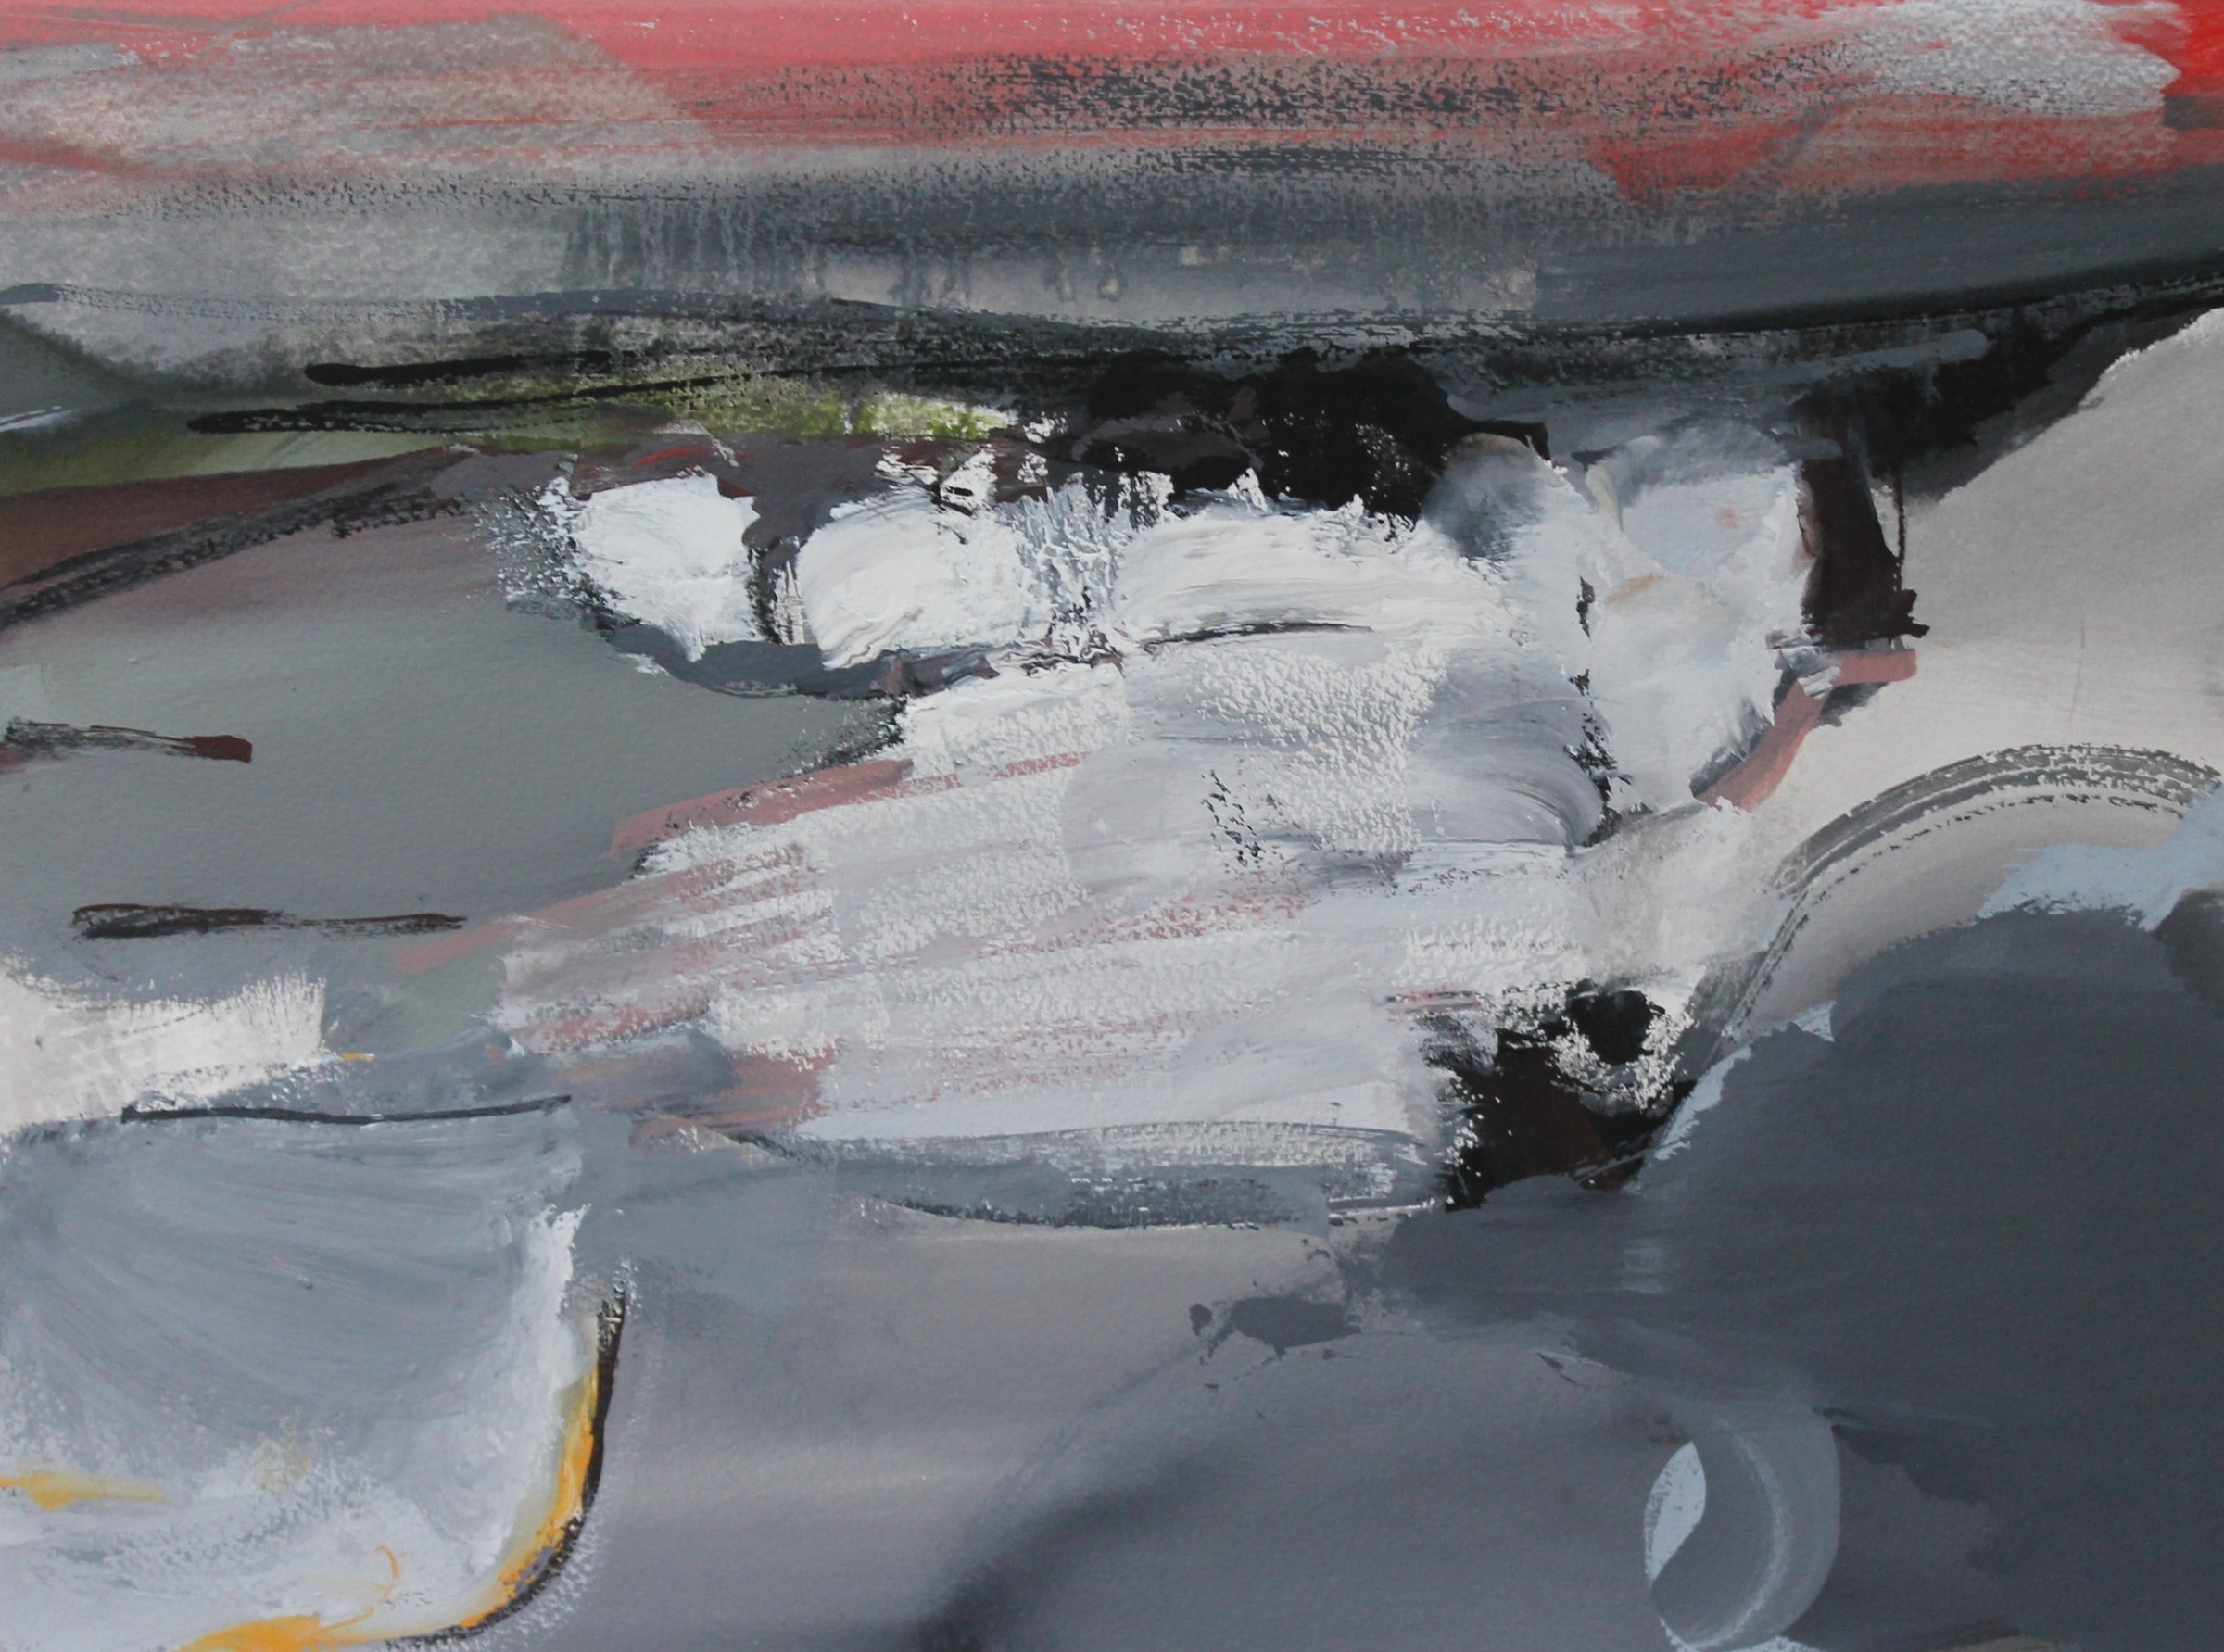 <span class=&#34;link fancybox-details-link&#34;><a href=&#34;/exhibitions/24/works/artworks_standalone10698/&#34;>View Detail Page</a></span><div class=&#34;artist&#34;><span class=&#34;artist&#34;><strong>Julie D. Cooper</strong></span></div><div class=&#34;title&#34;><em>Salty Moonlight</em></div><div class=&#34;medium&#34;>gouache</div><div class=&#34;dimensions&#34;>40 x 50cm</div>